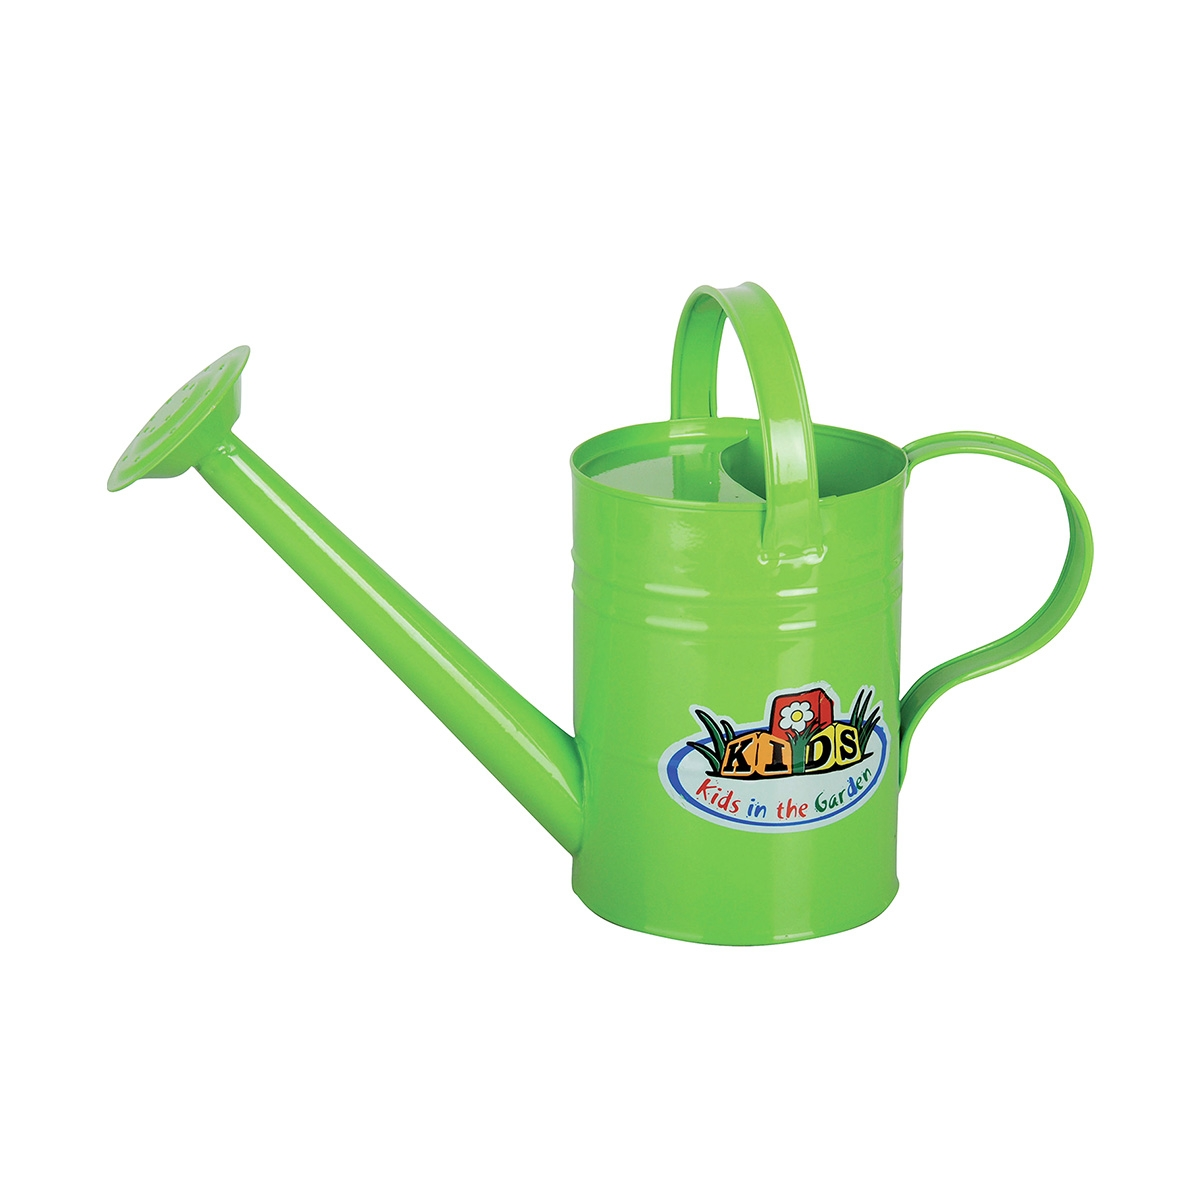 Arrosoir Enfant vert en zinc - esschert design